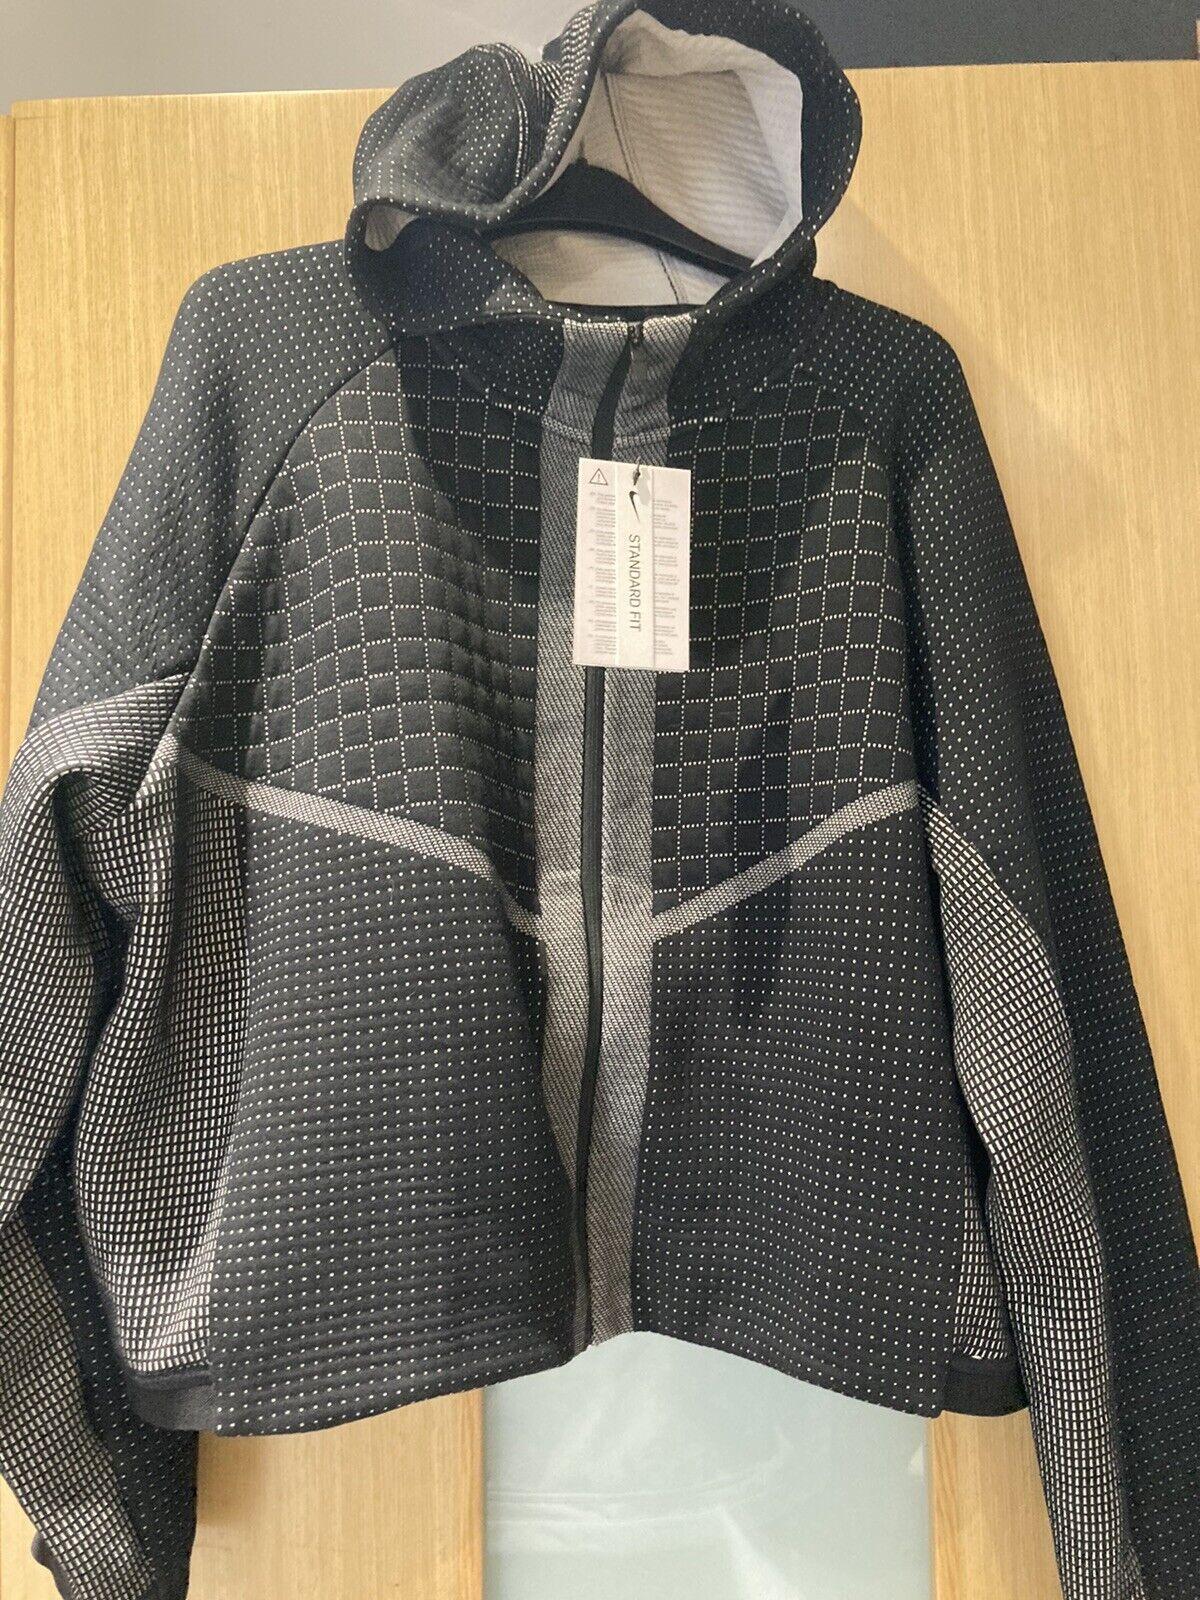 Nike Tech Pack City Ready Black Zip Up Hoody Ladies Large BNWT CI9432-011